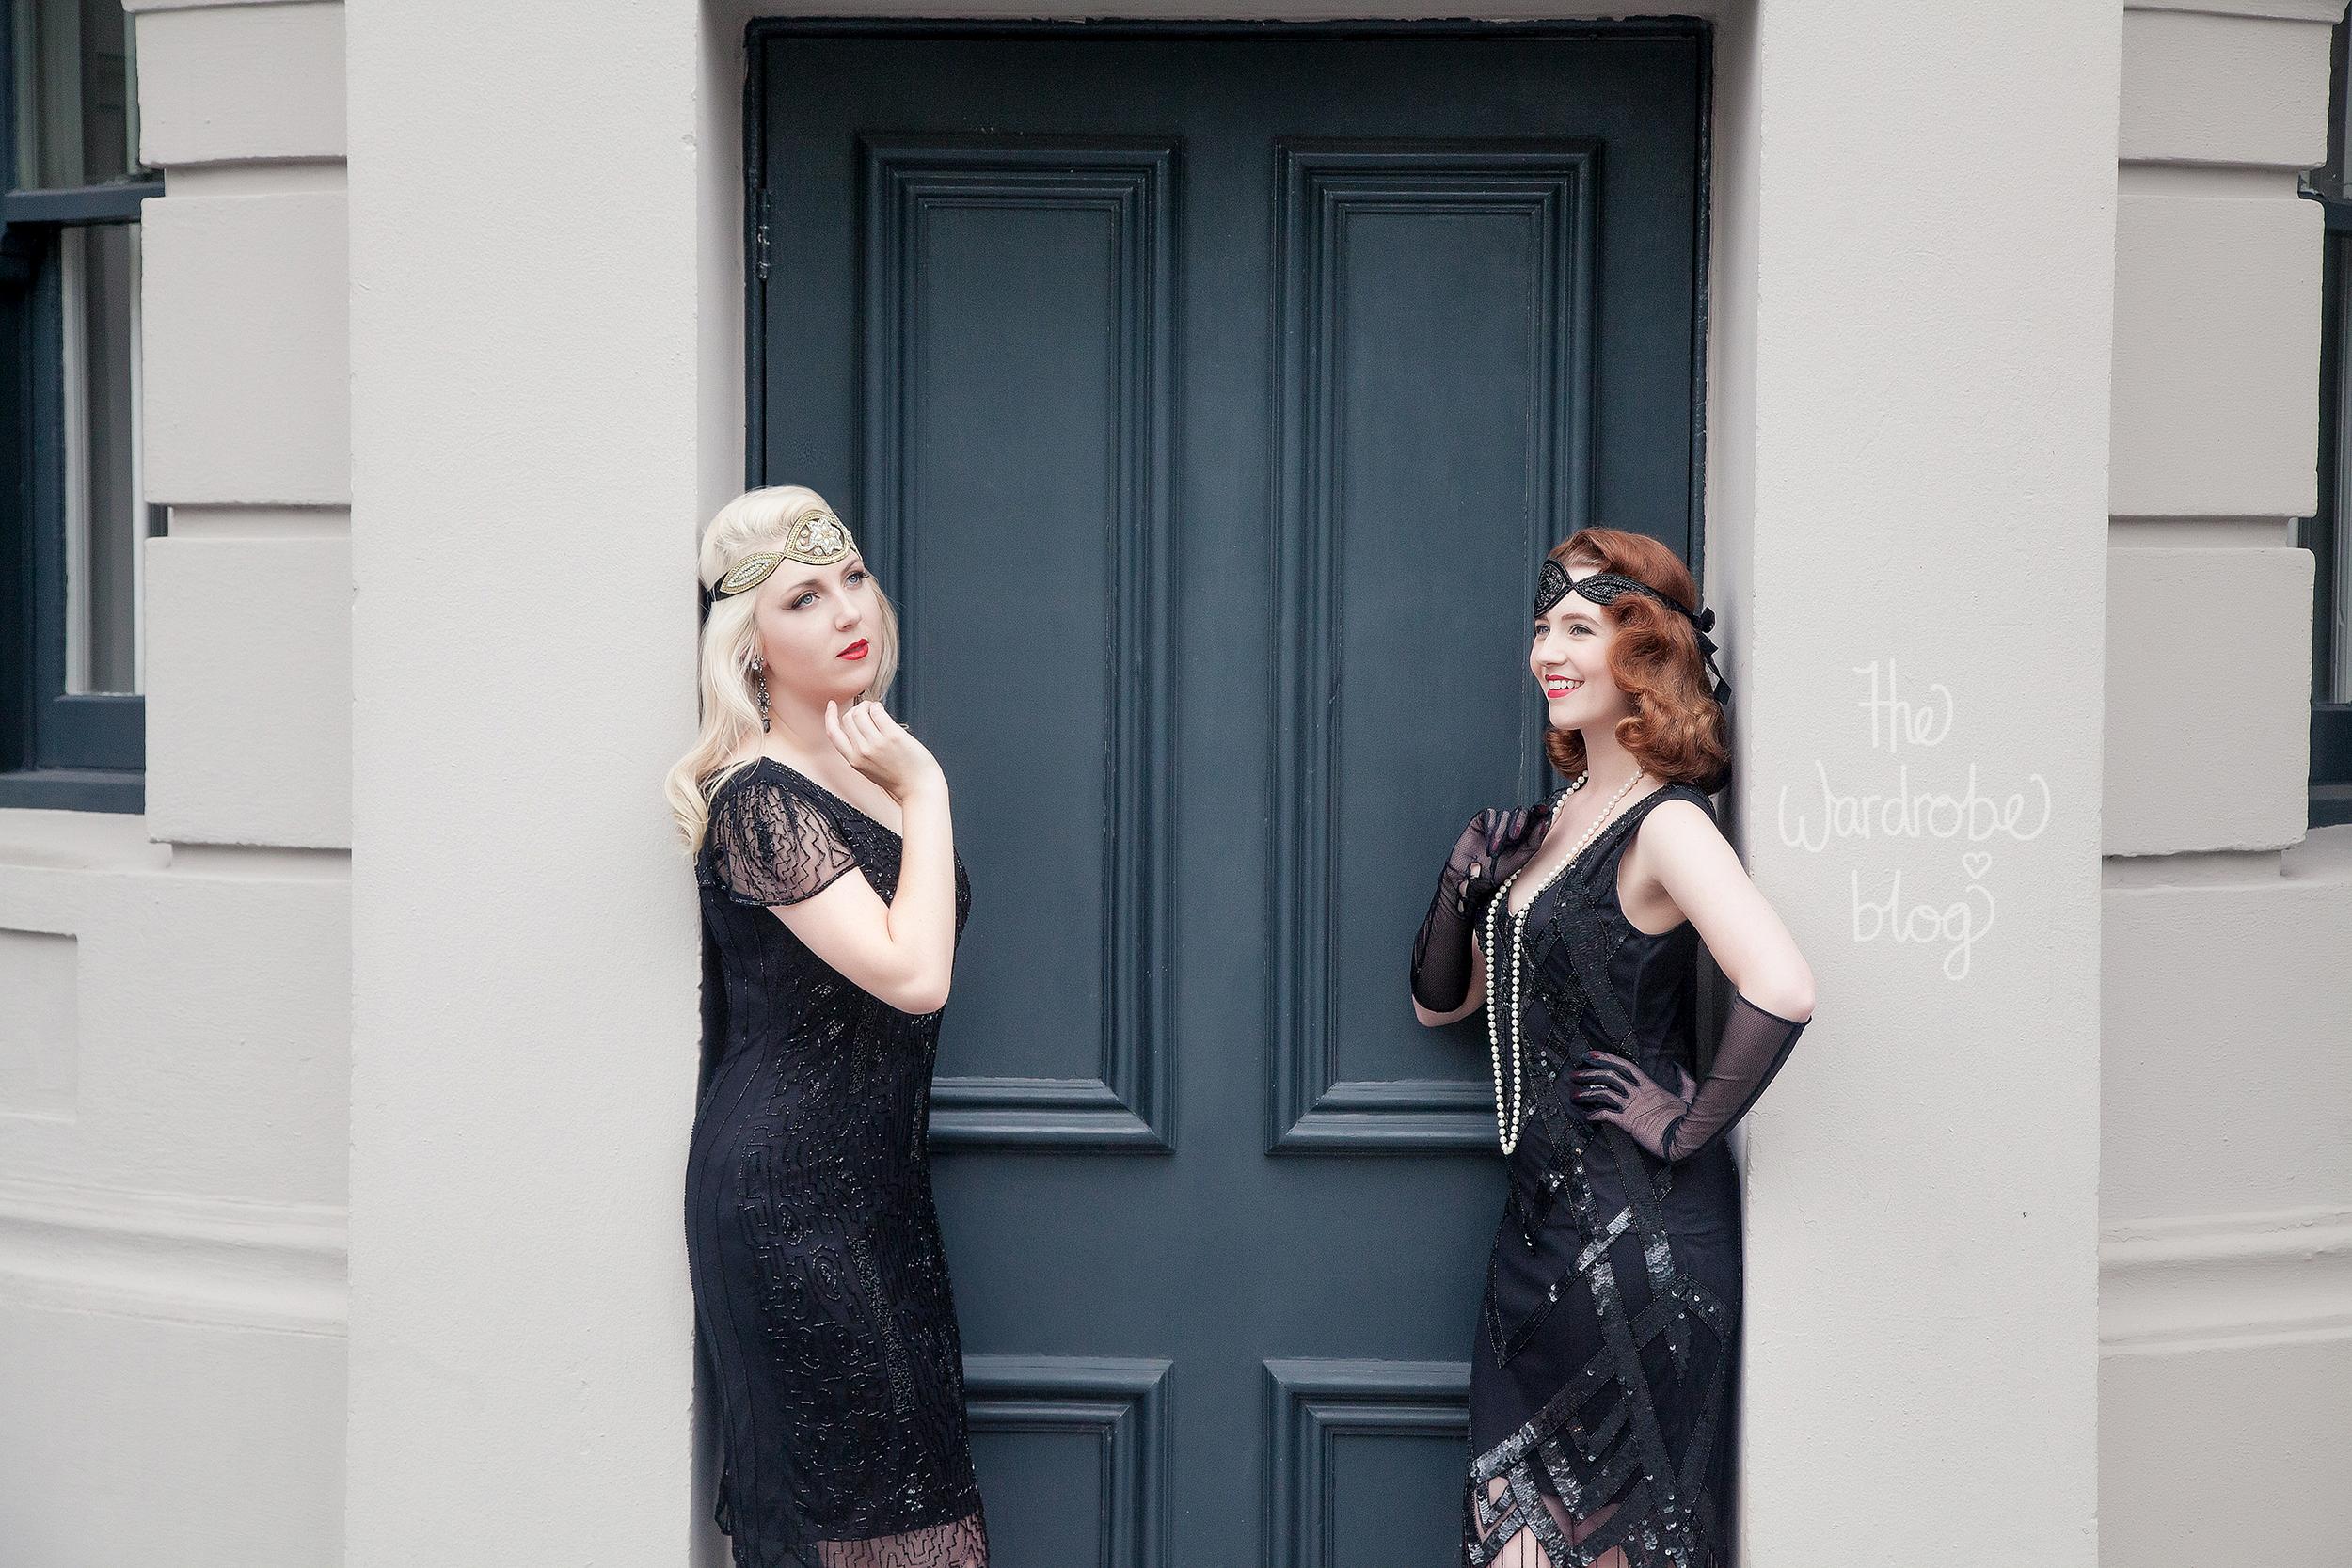 I wear: Downton Abbey Vintage Inspired Flapper Dress in Black, with the Amelia Vintage headband. Earrings + Bracelet from Lovisa.// Miss HH wears:Glitz Vintage Inspired Fringe Dress in Black, and the Julia Vintage headband.